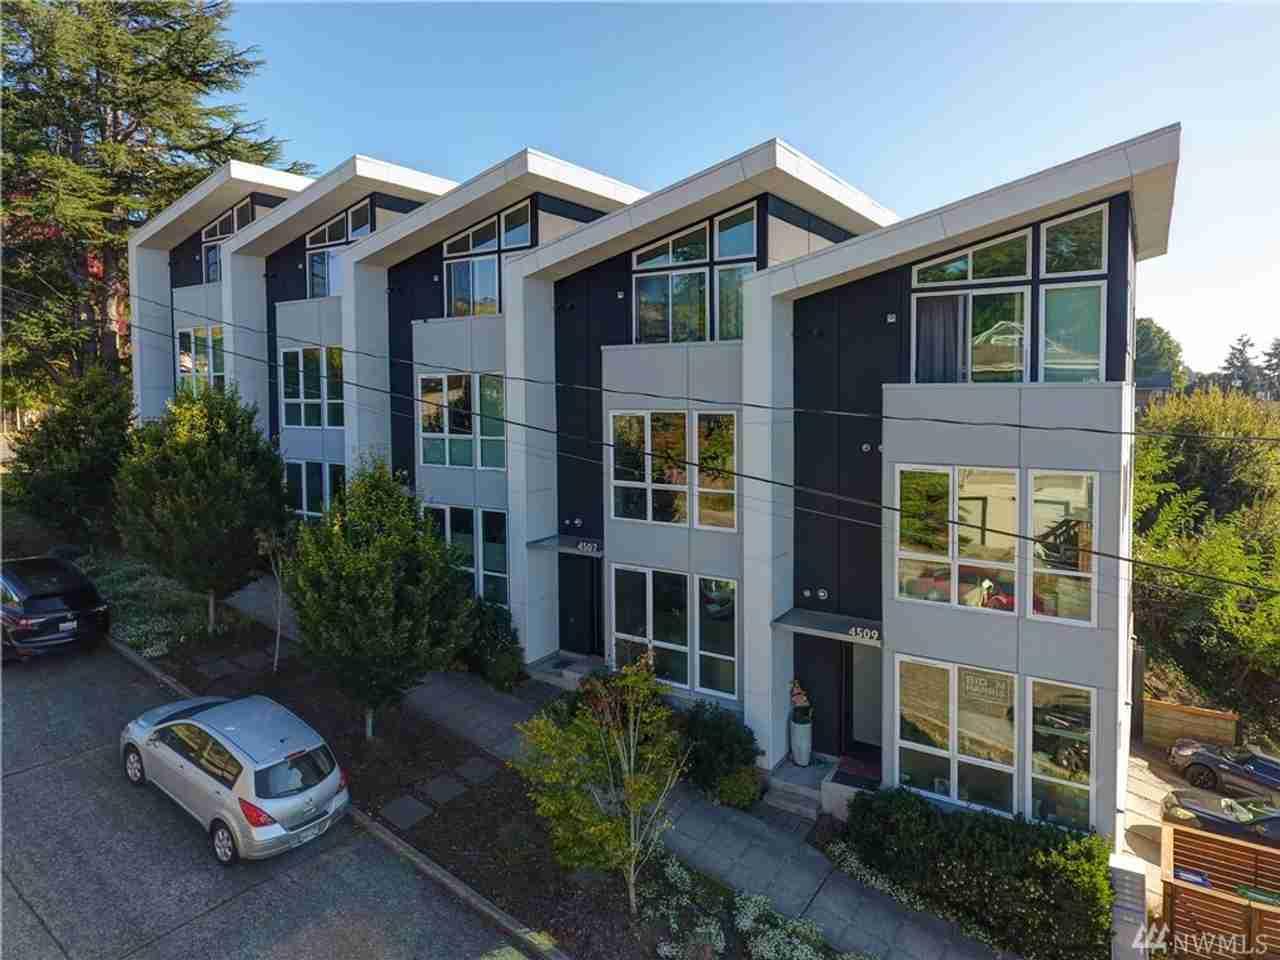 4507 SW Oregon St Seattle, WA, 98116